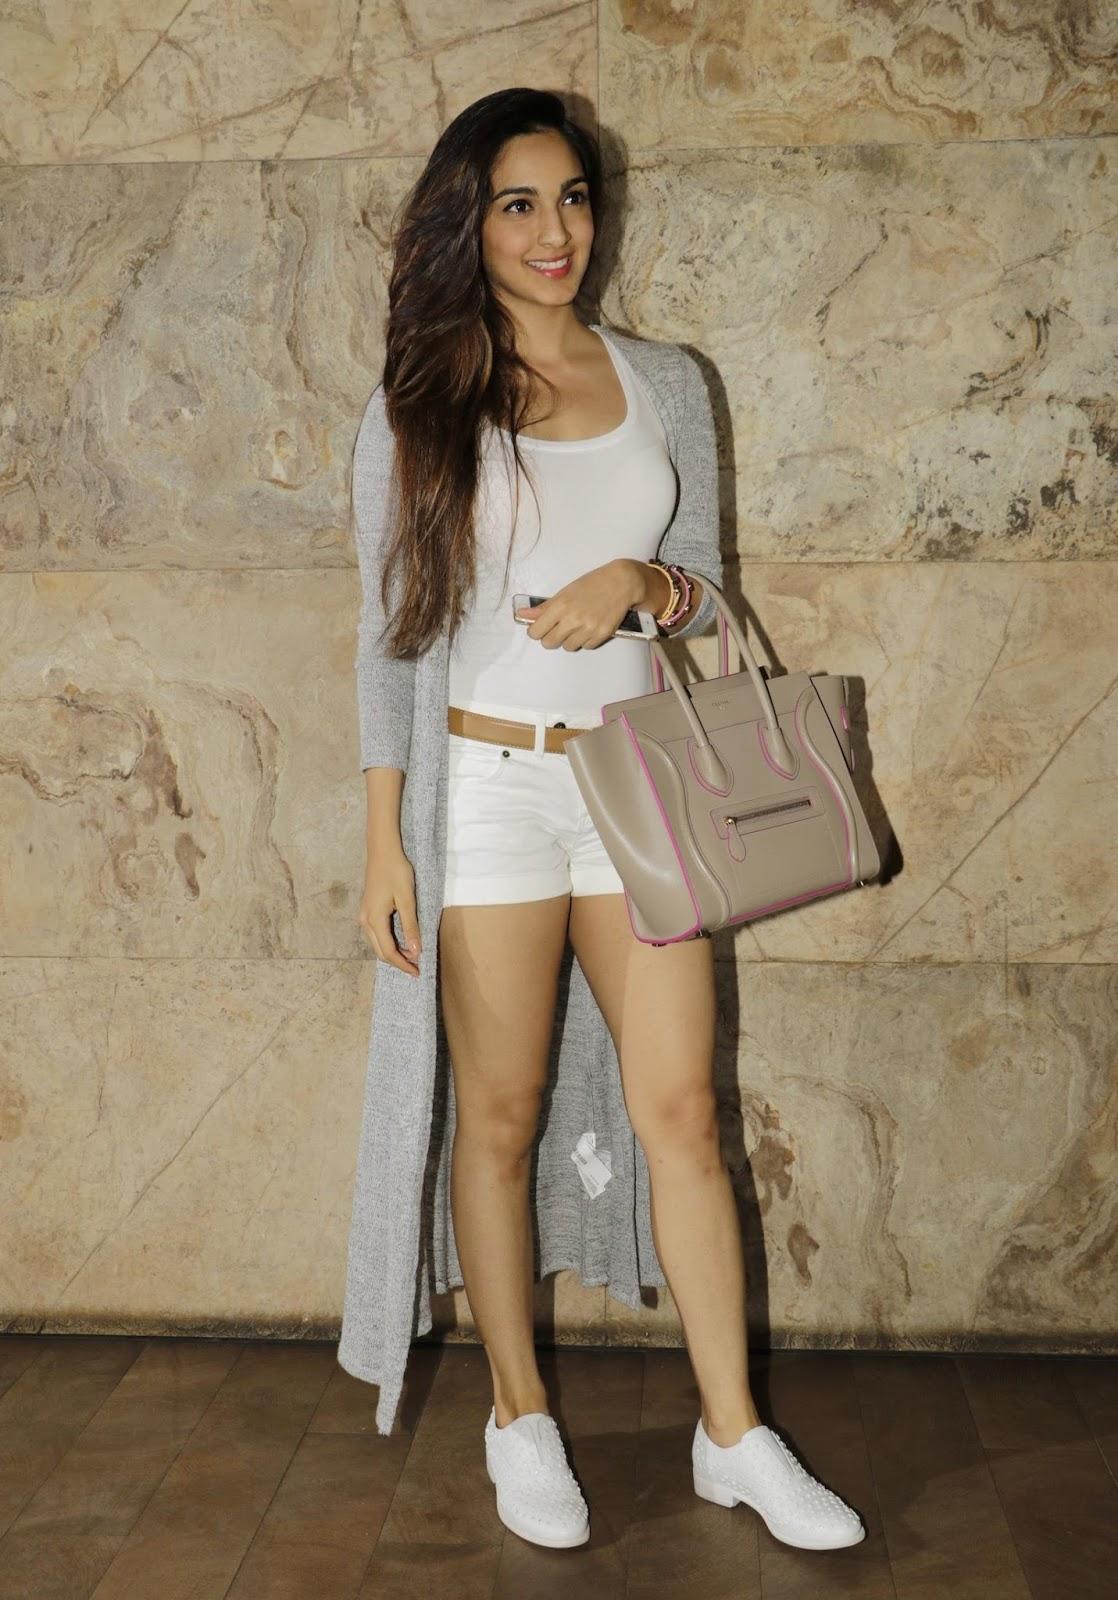 Kiara Advani Showcasing Her Sexy Long Legs At Film 'Bajrangi Bhaijaan' Special Screening At Lightbox Cinema, Mumbai ❤ ❤  ❤